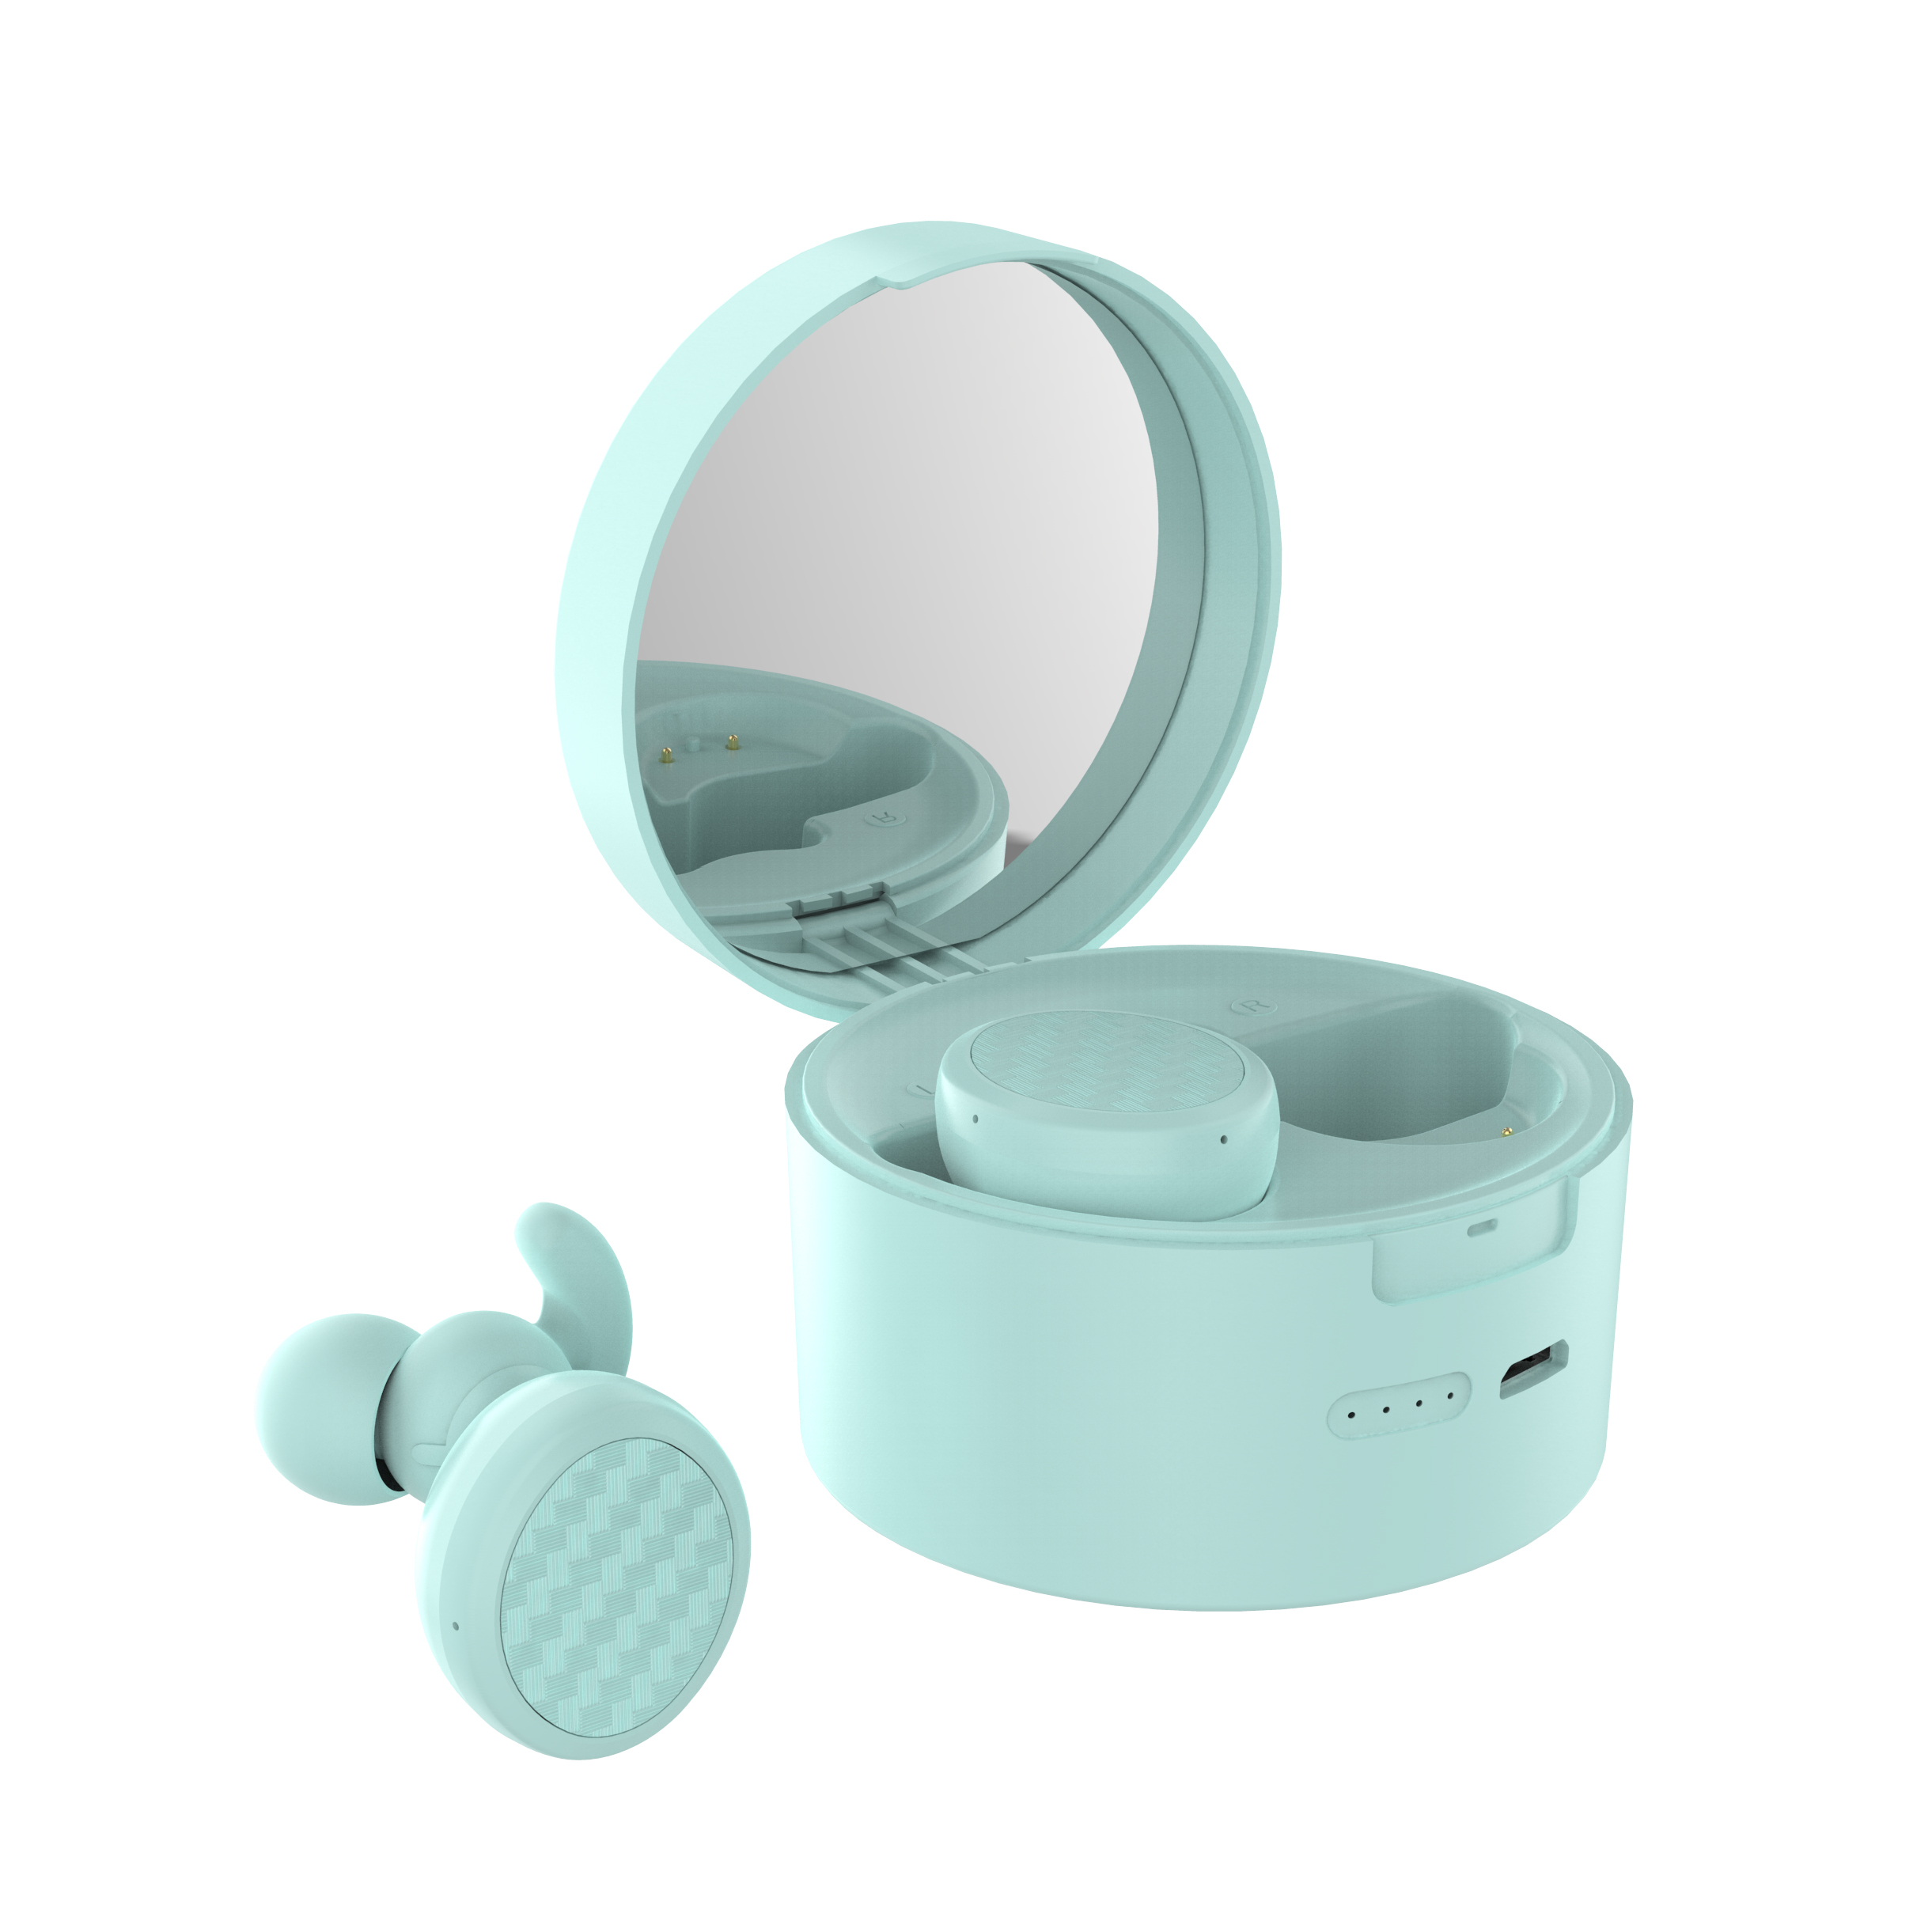 TWS Bluetooth Earphone Cosmetic Mirror 5.0 Earplugs Stereo Wireless Headset Phone Bracket blue